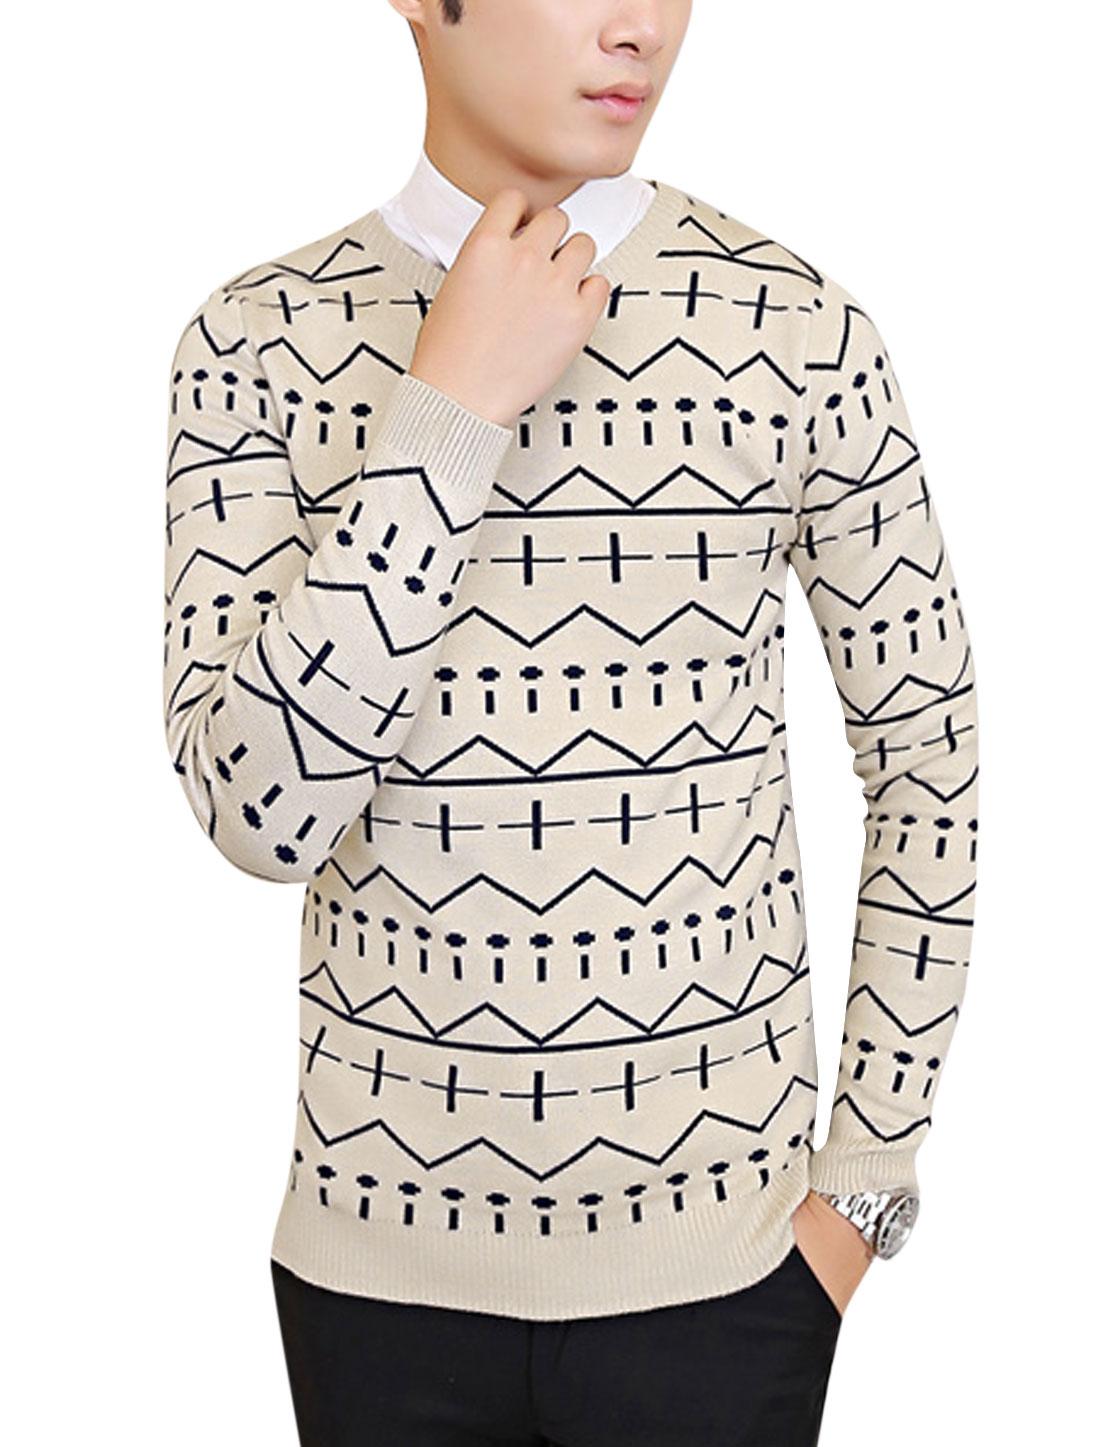 Slipover Round Neck Zig-Zag Pattern Casual Knit Shirt for Men Beige M